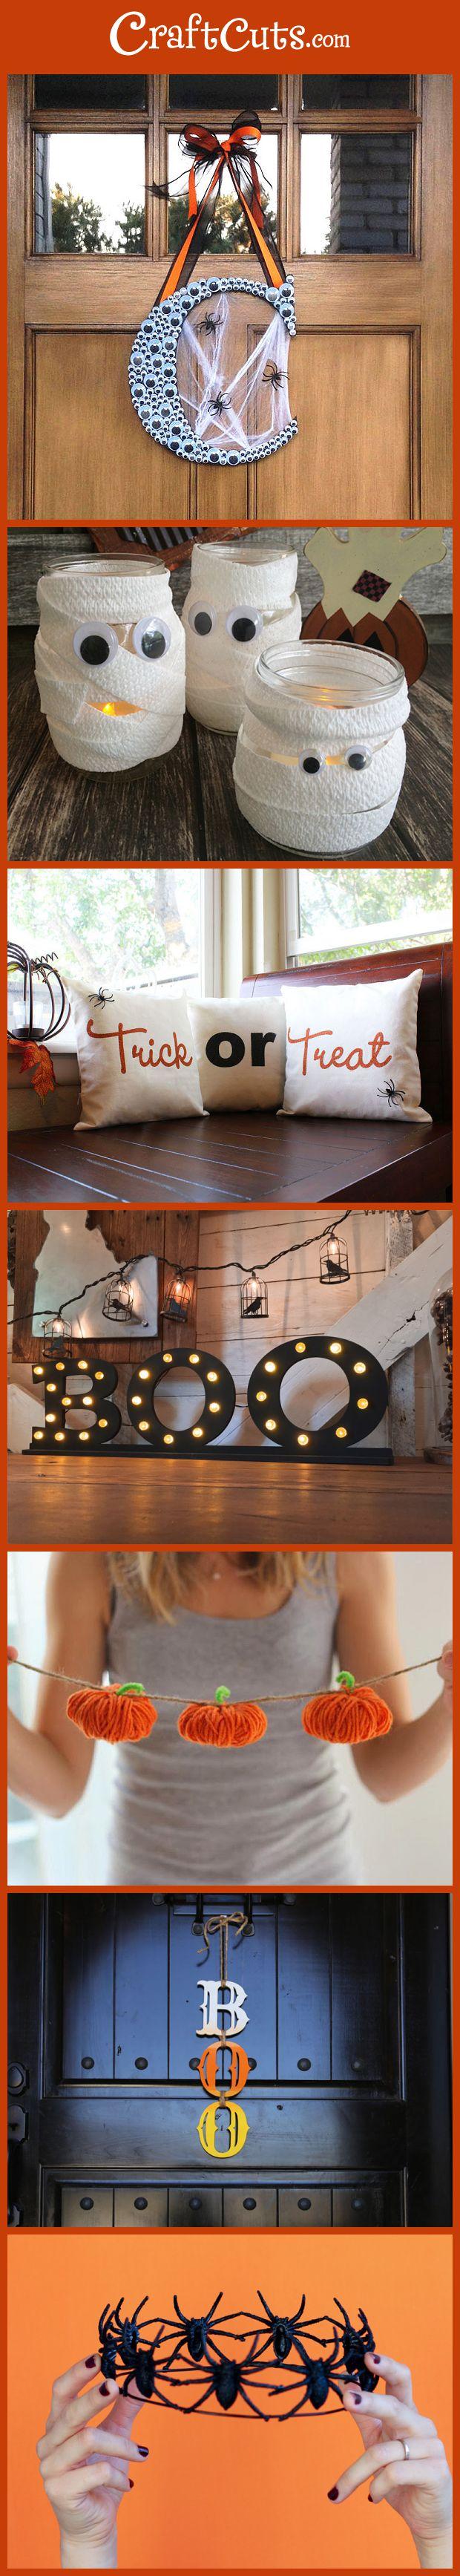 Best 25+ Homemade halloween decorations ideas on Pinterest | Easy halloween  decorations diy, Easy halloween decorations and Halloween dance